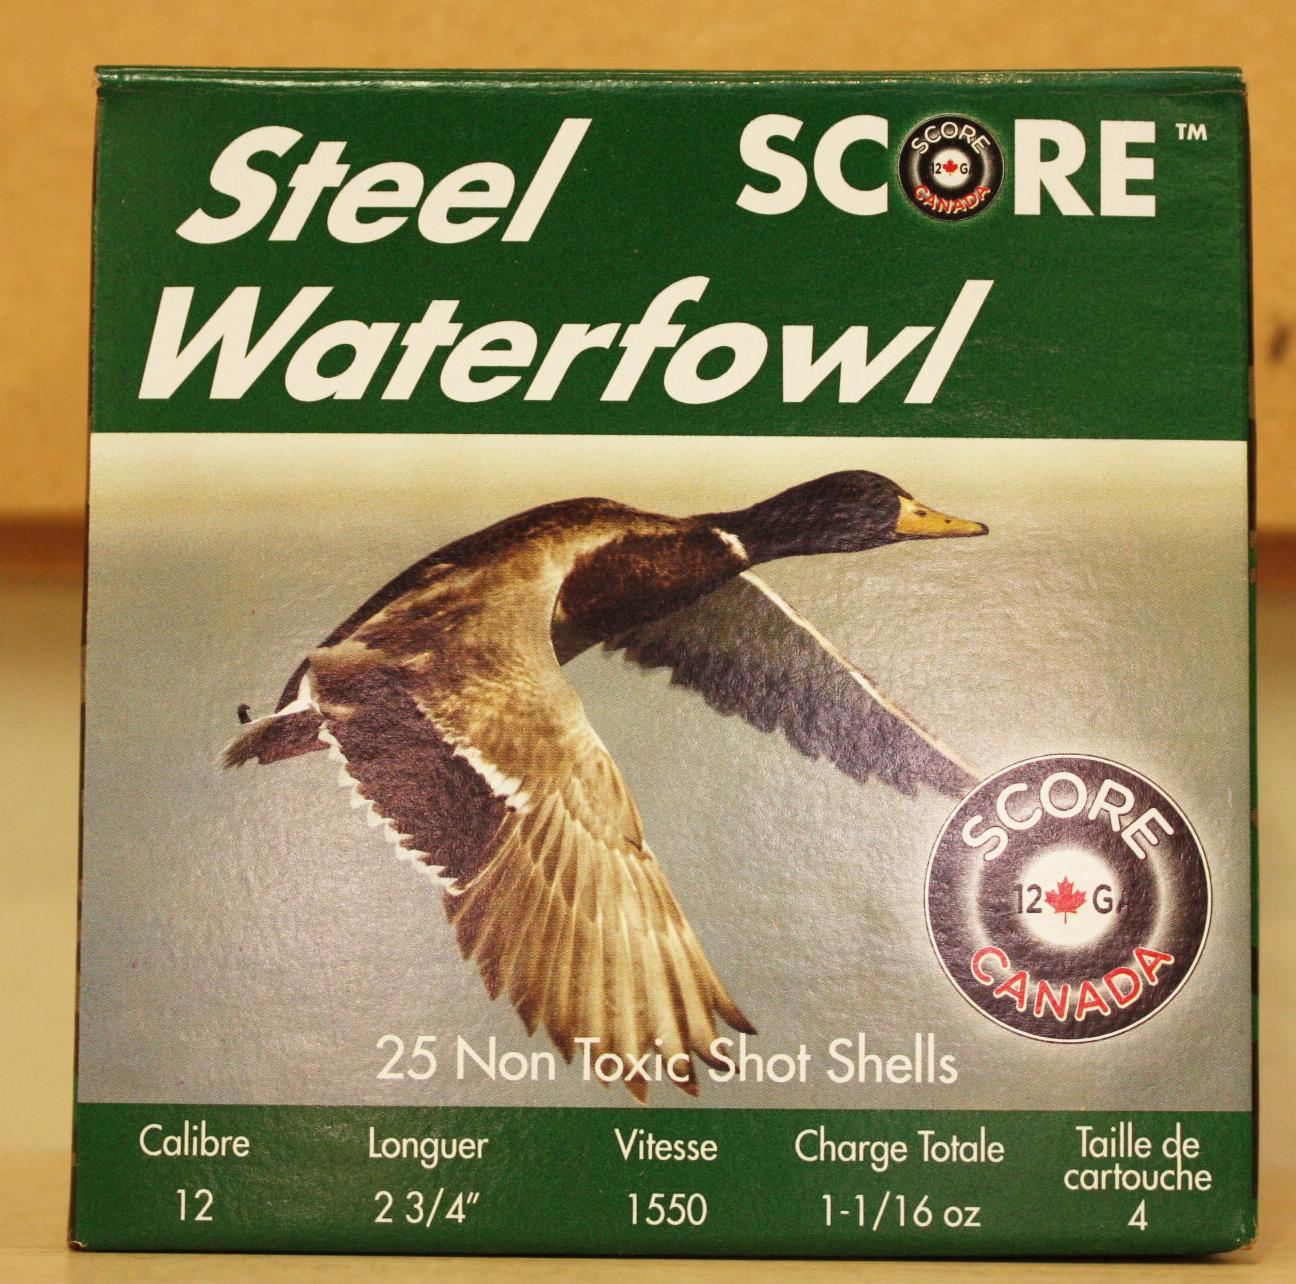 "Score Ammunition Score Ammunition 12 Gauge 2 3/4"" 1 1/16oz Steel Waterfowl Loads (25 Rounds)"